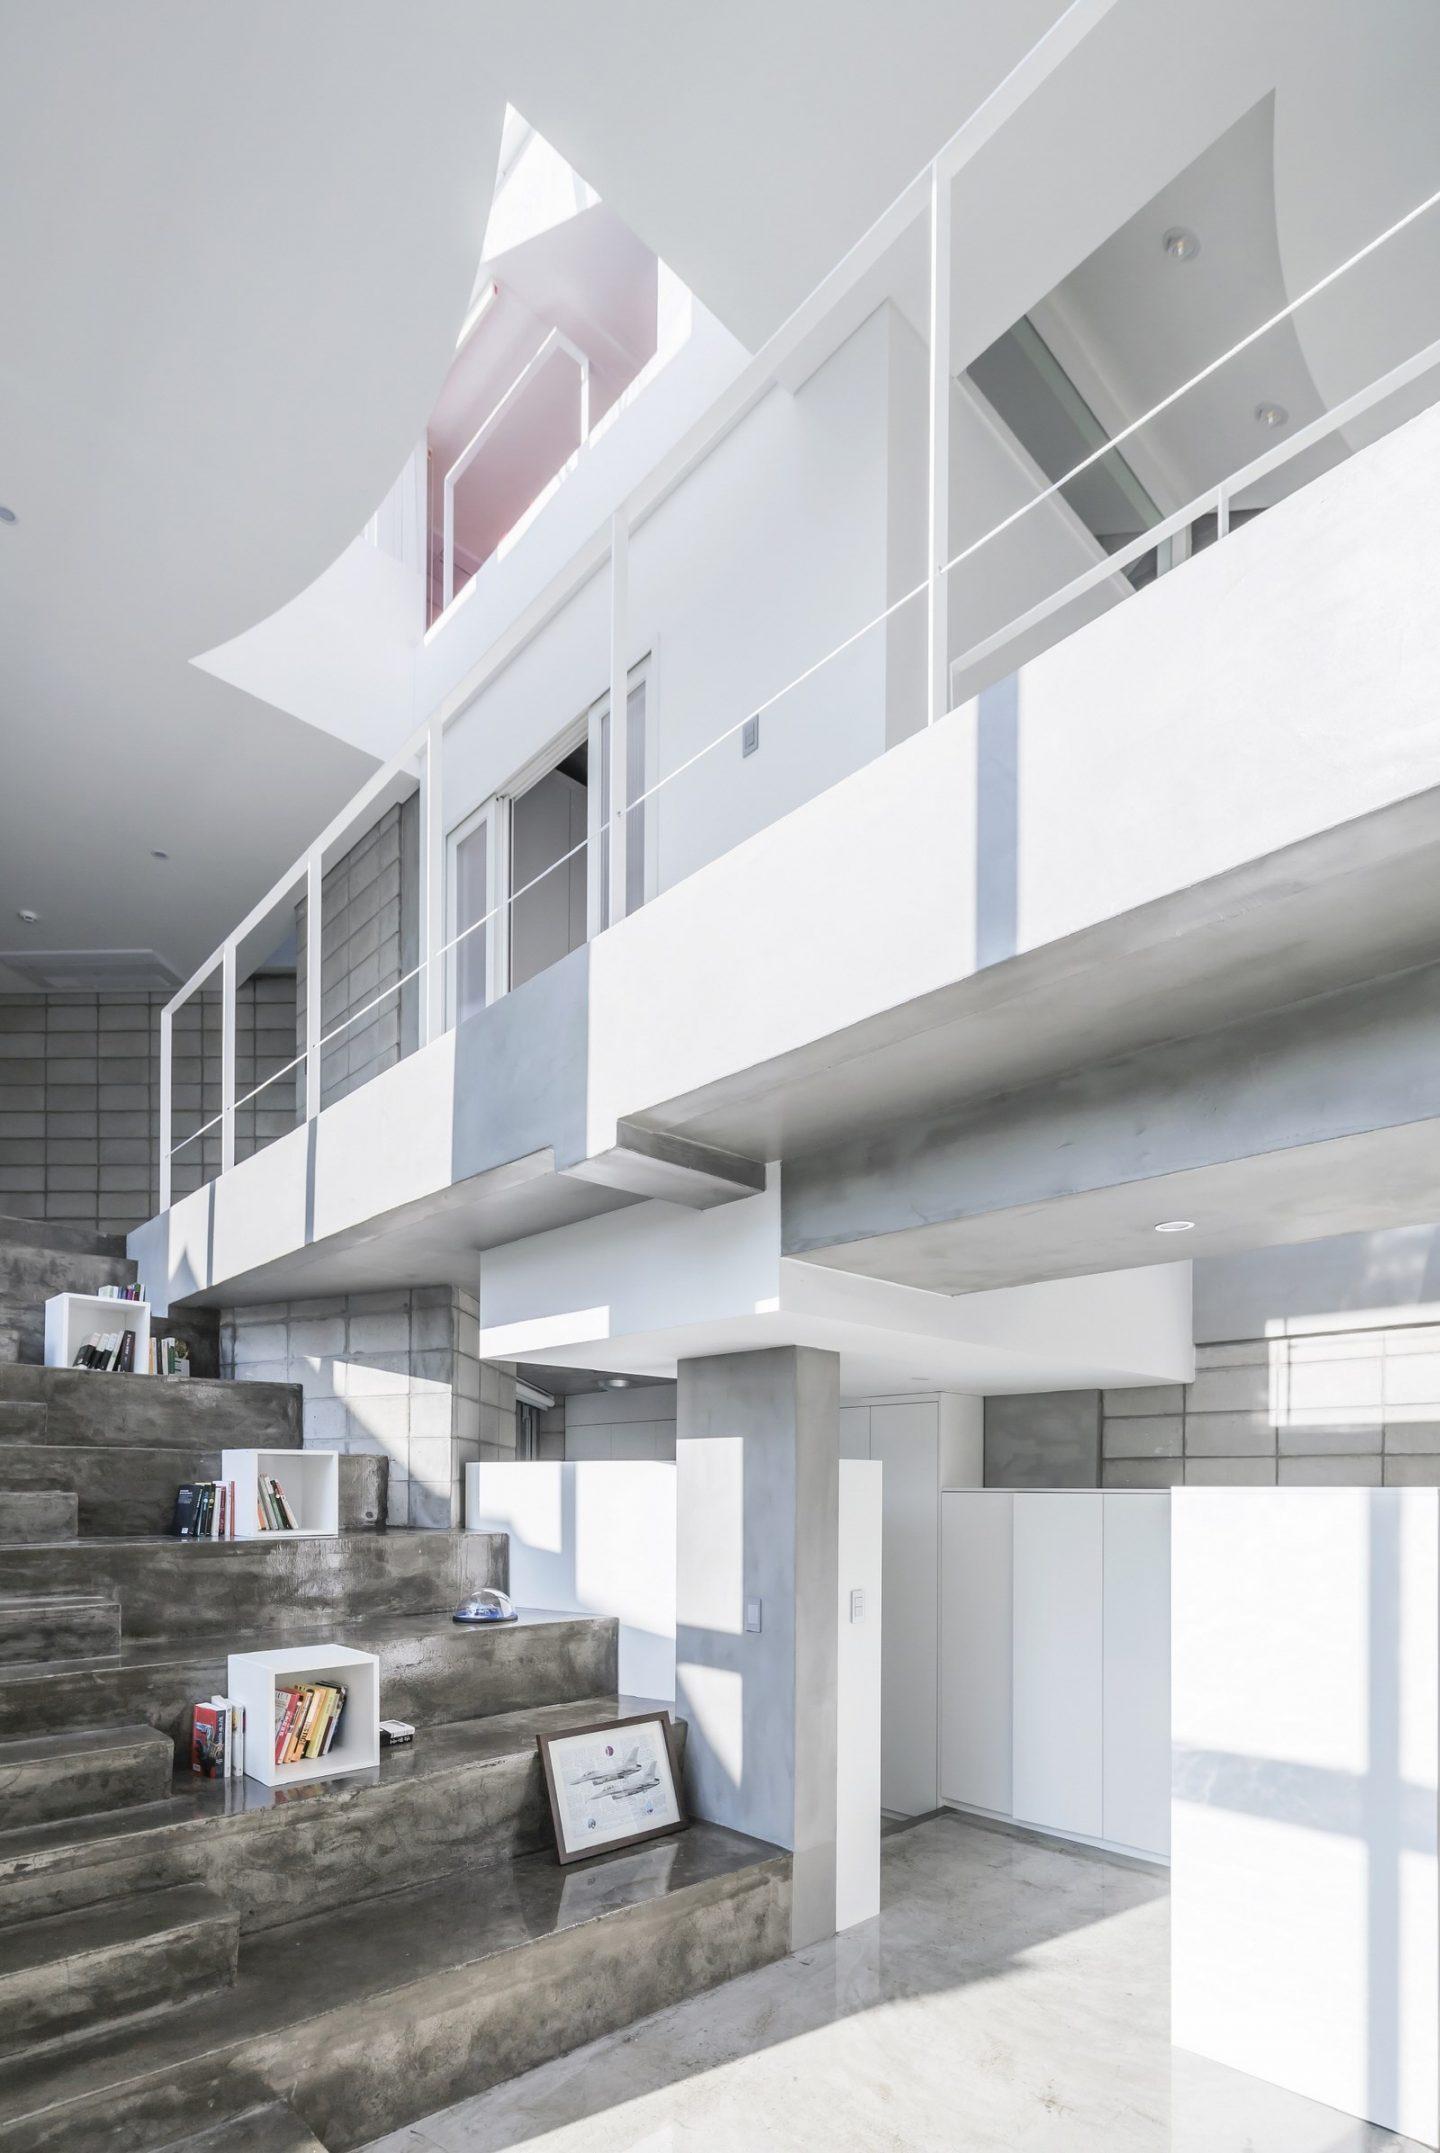 Iroje_KHM_Architecture (16)